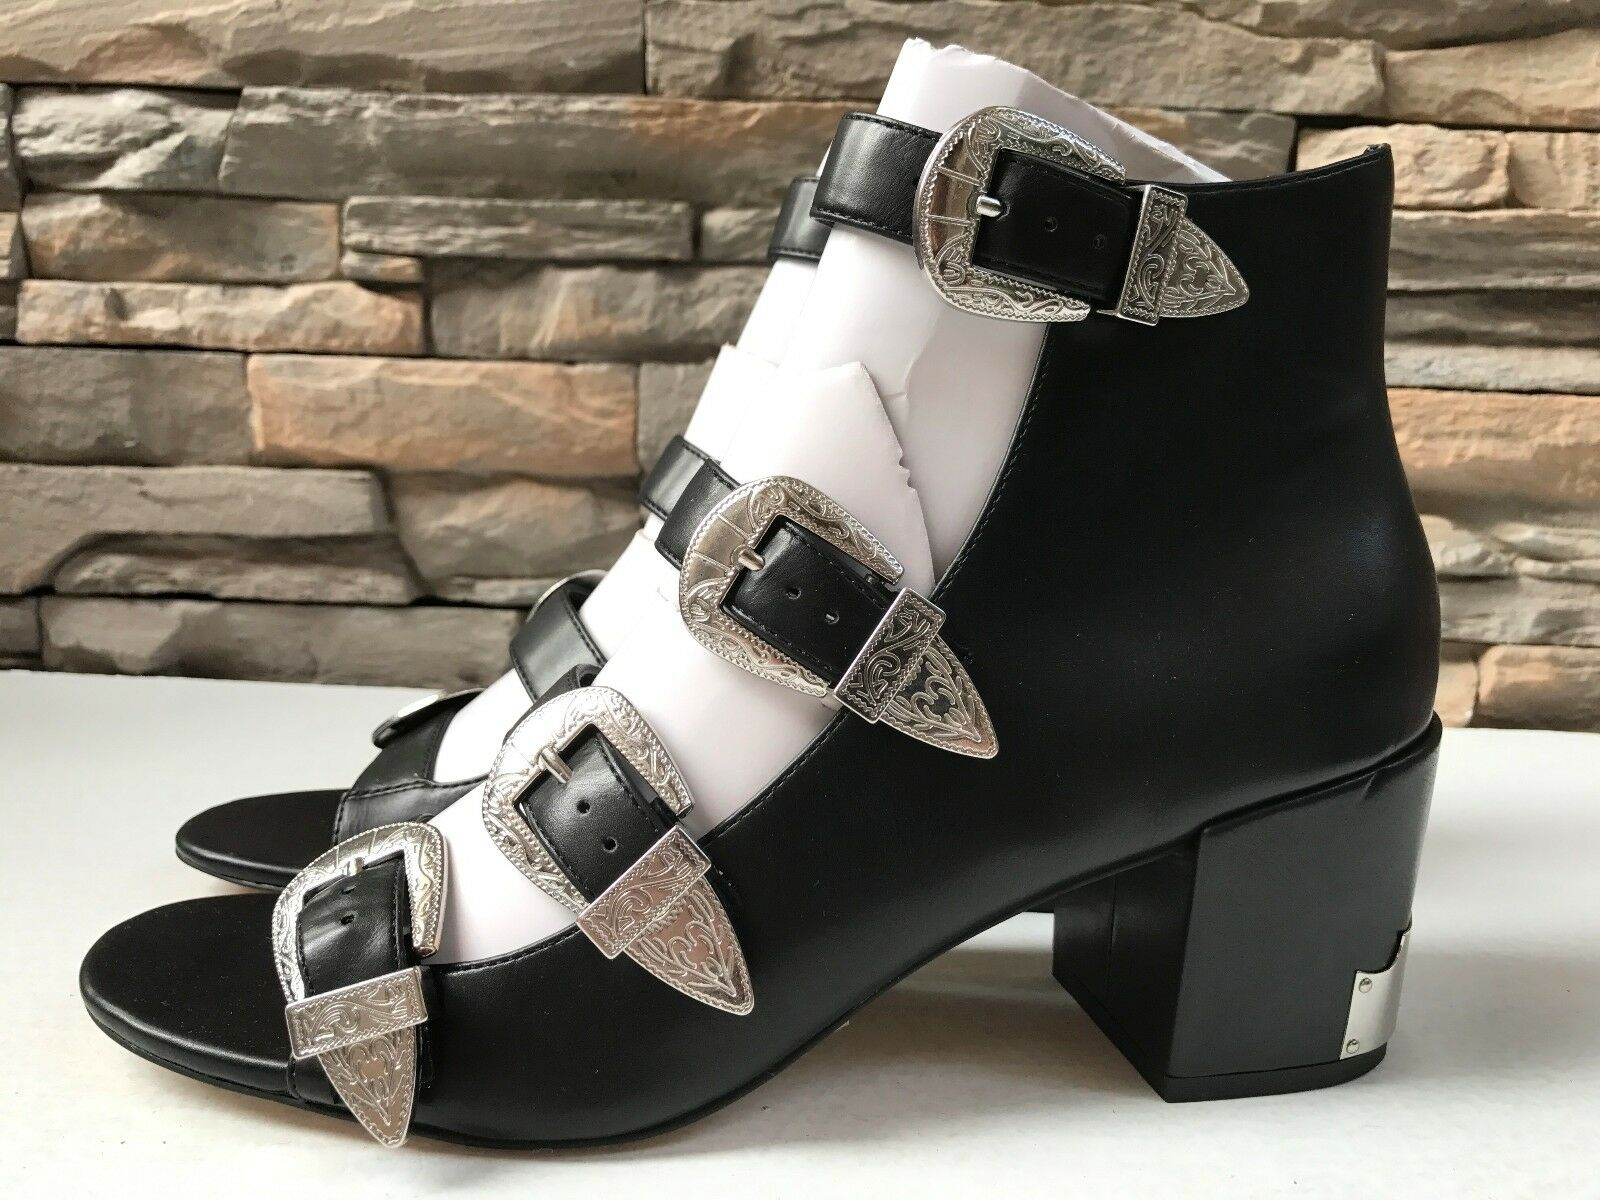 Asos Over Time Western Western Time Black Gladiator Sandals with Buckles Heels US10 EU41 UK8 85f734